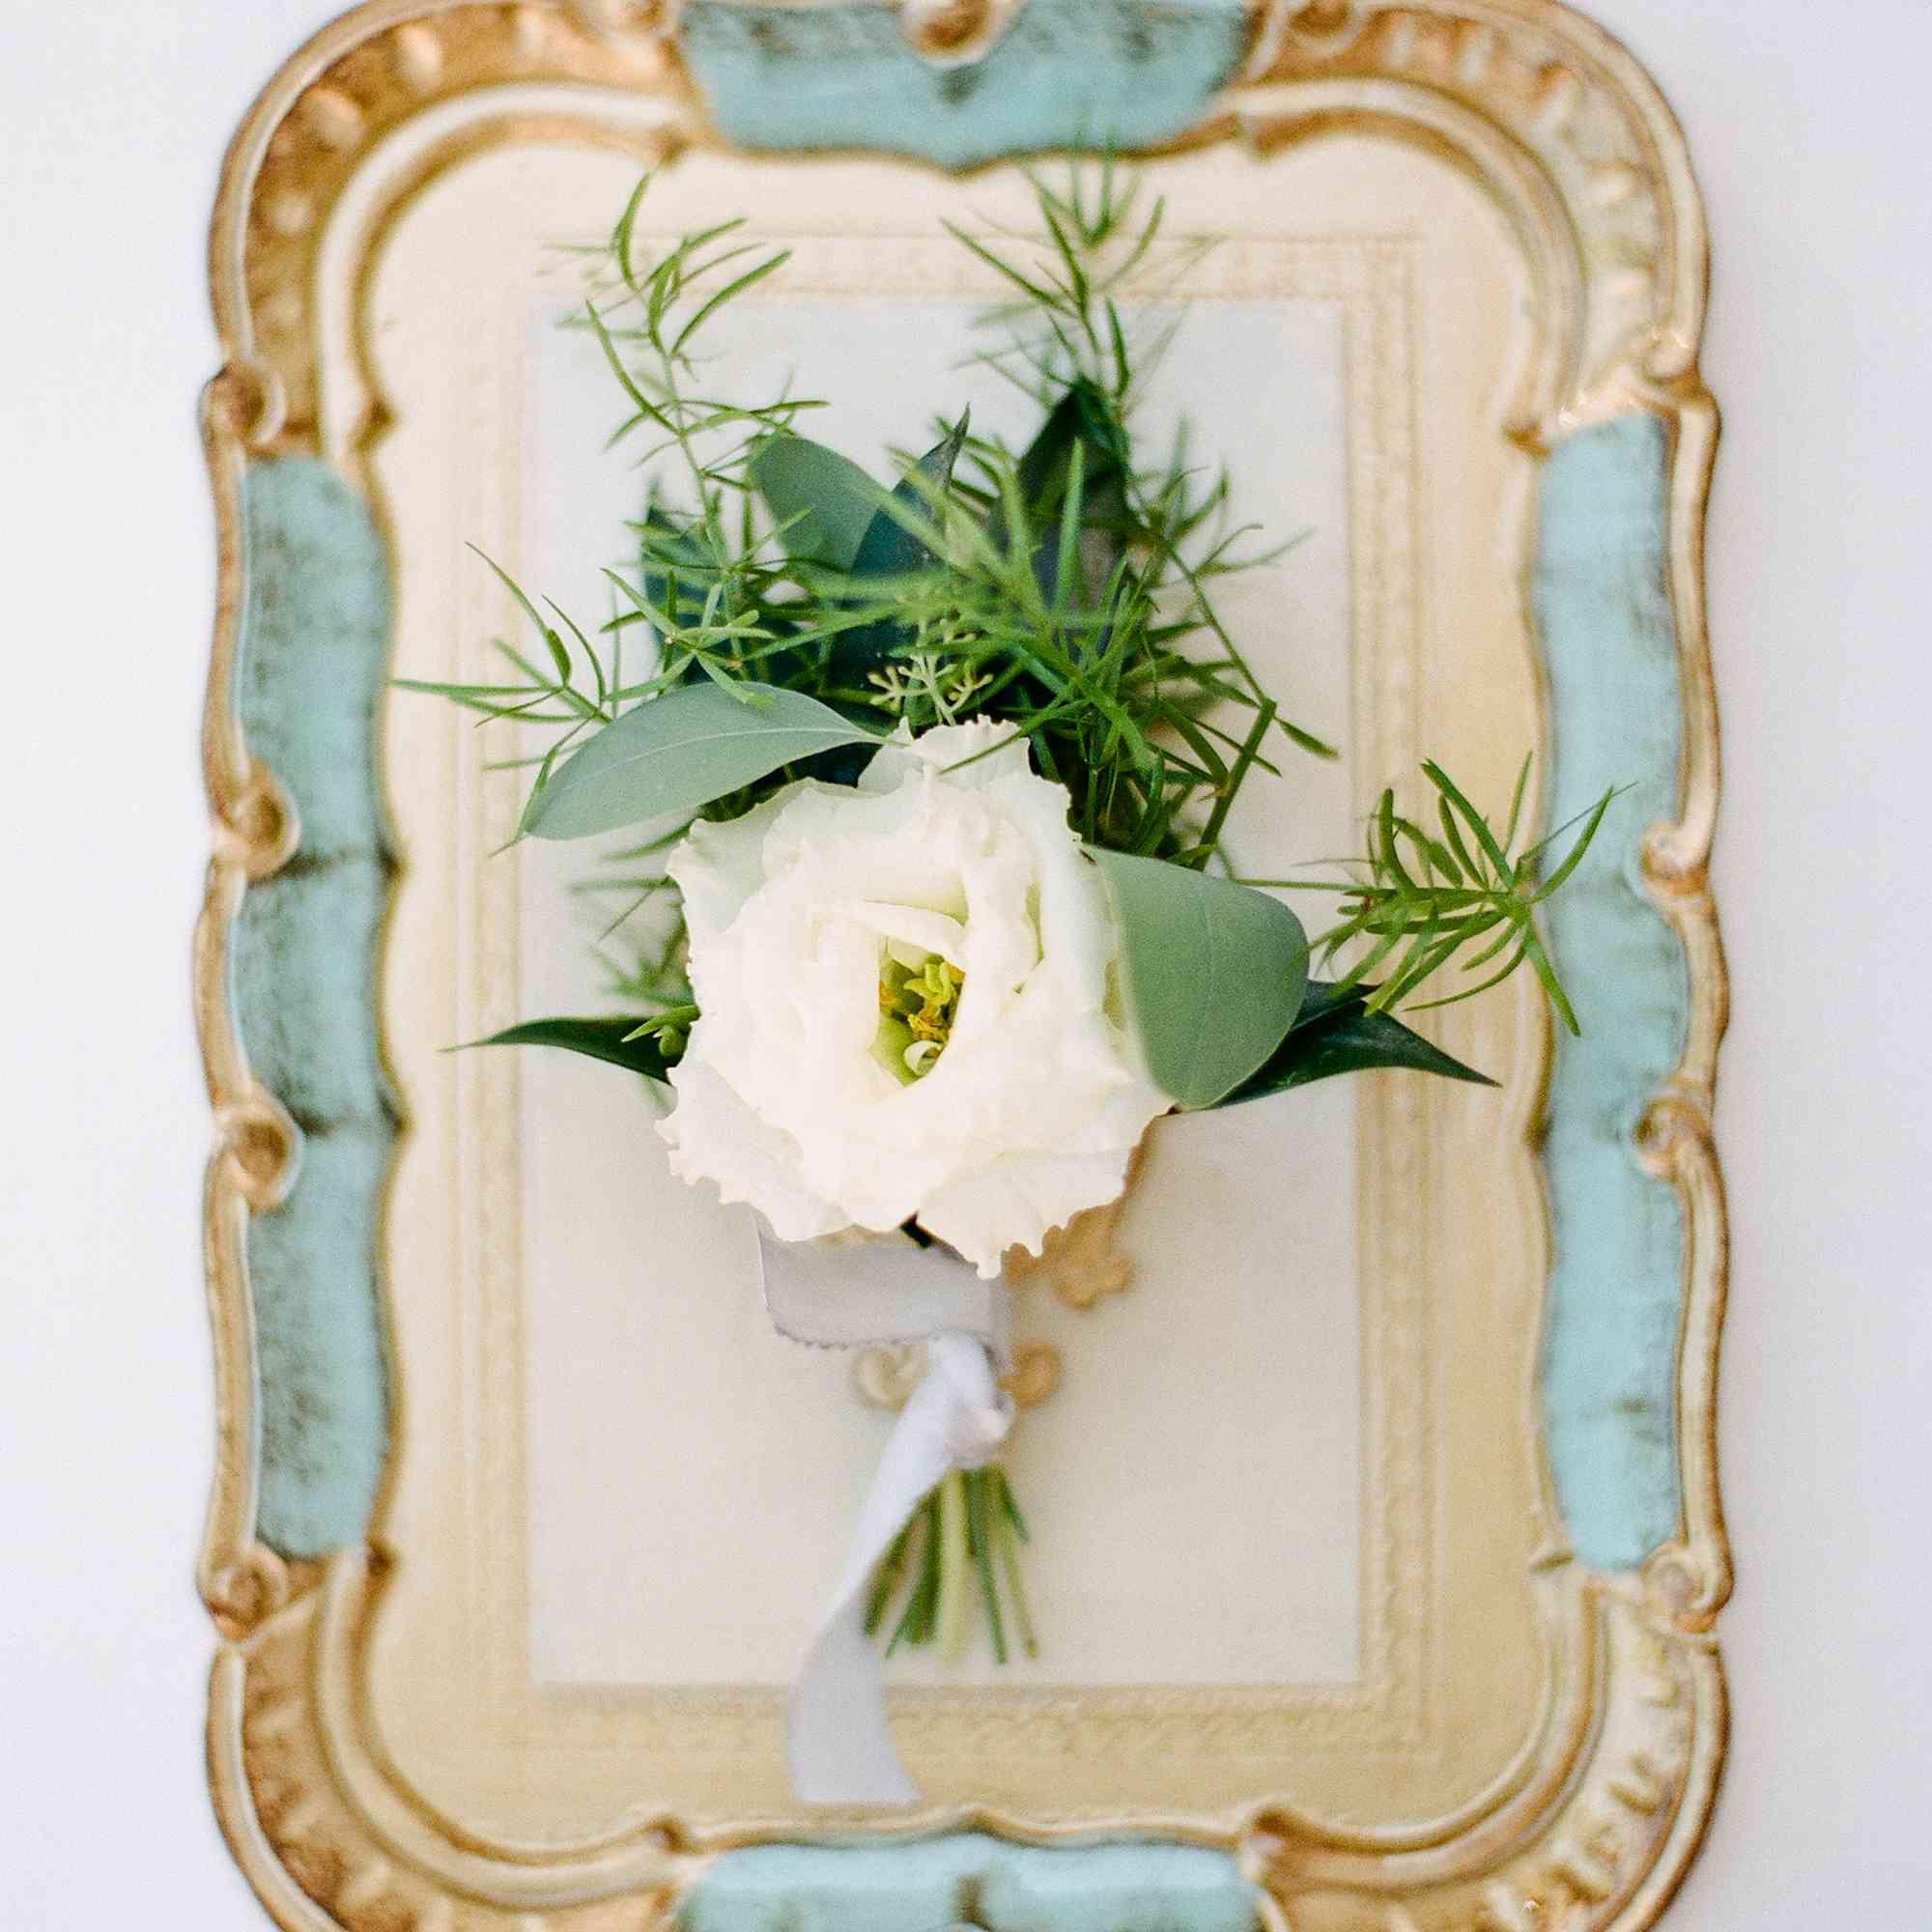 <p>Floral arrangement on tray</p><br><br>